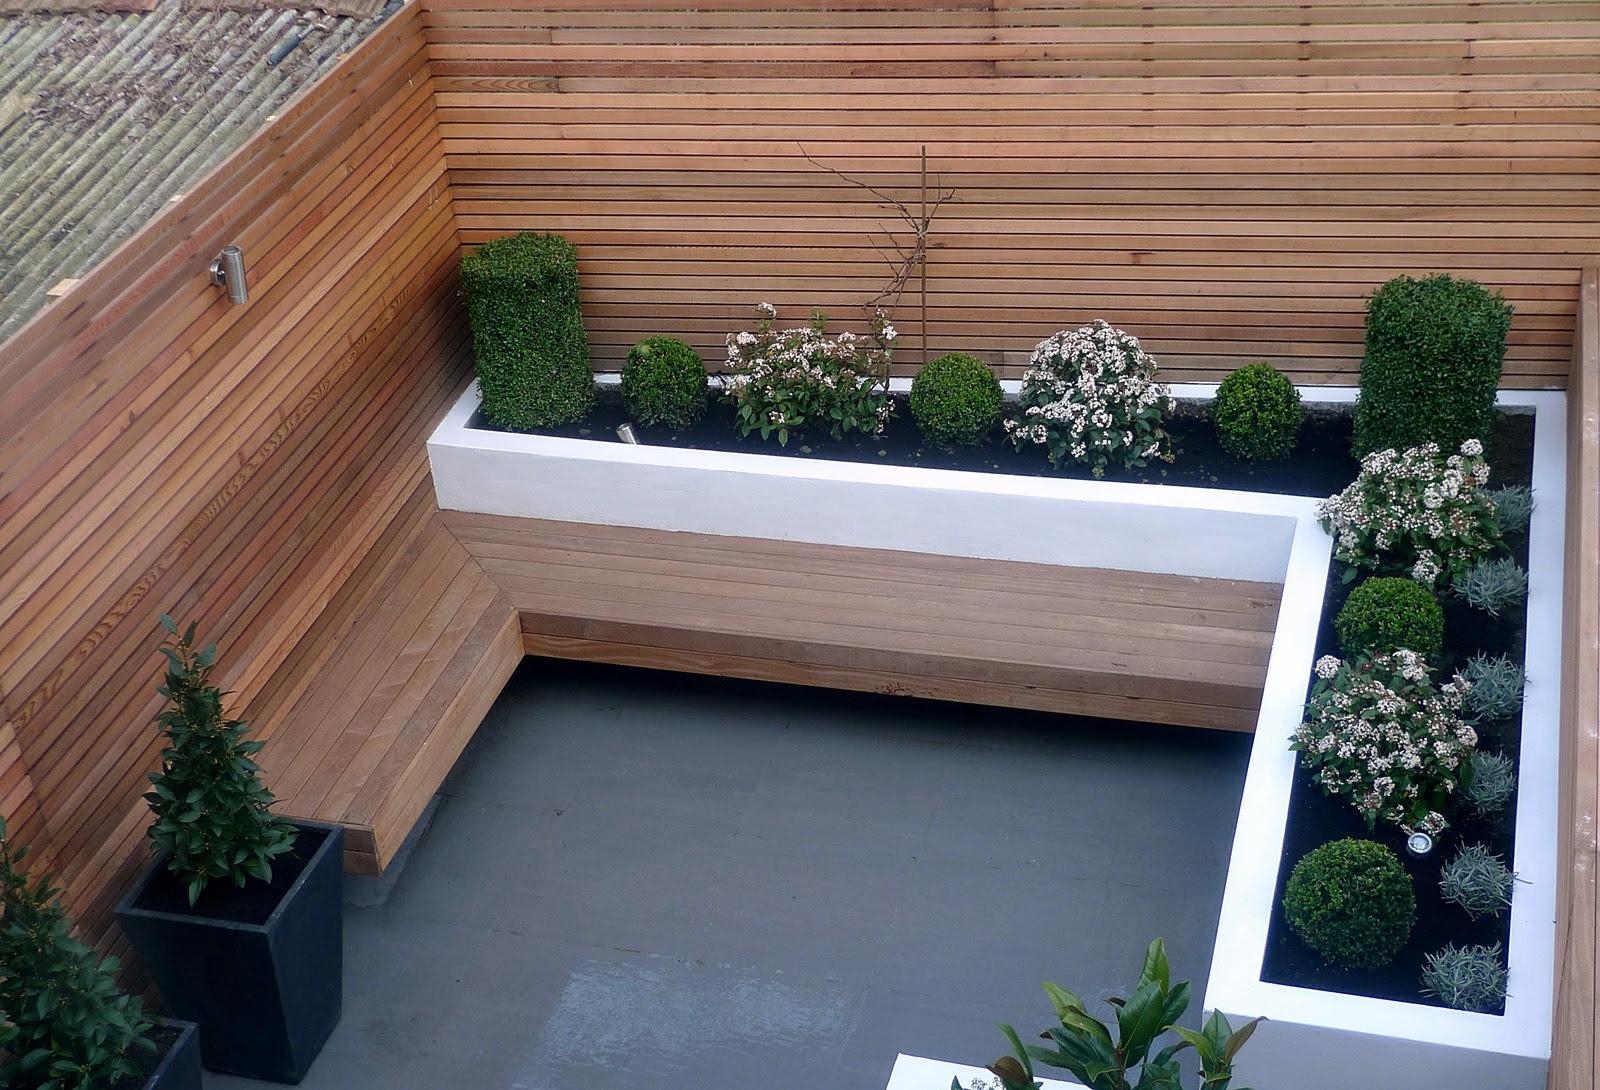 Garden Design Designer Clapham Balham Battersea Small Garden Low Maintenance London London Garden Blog